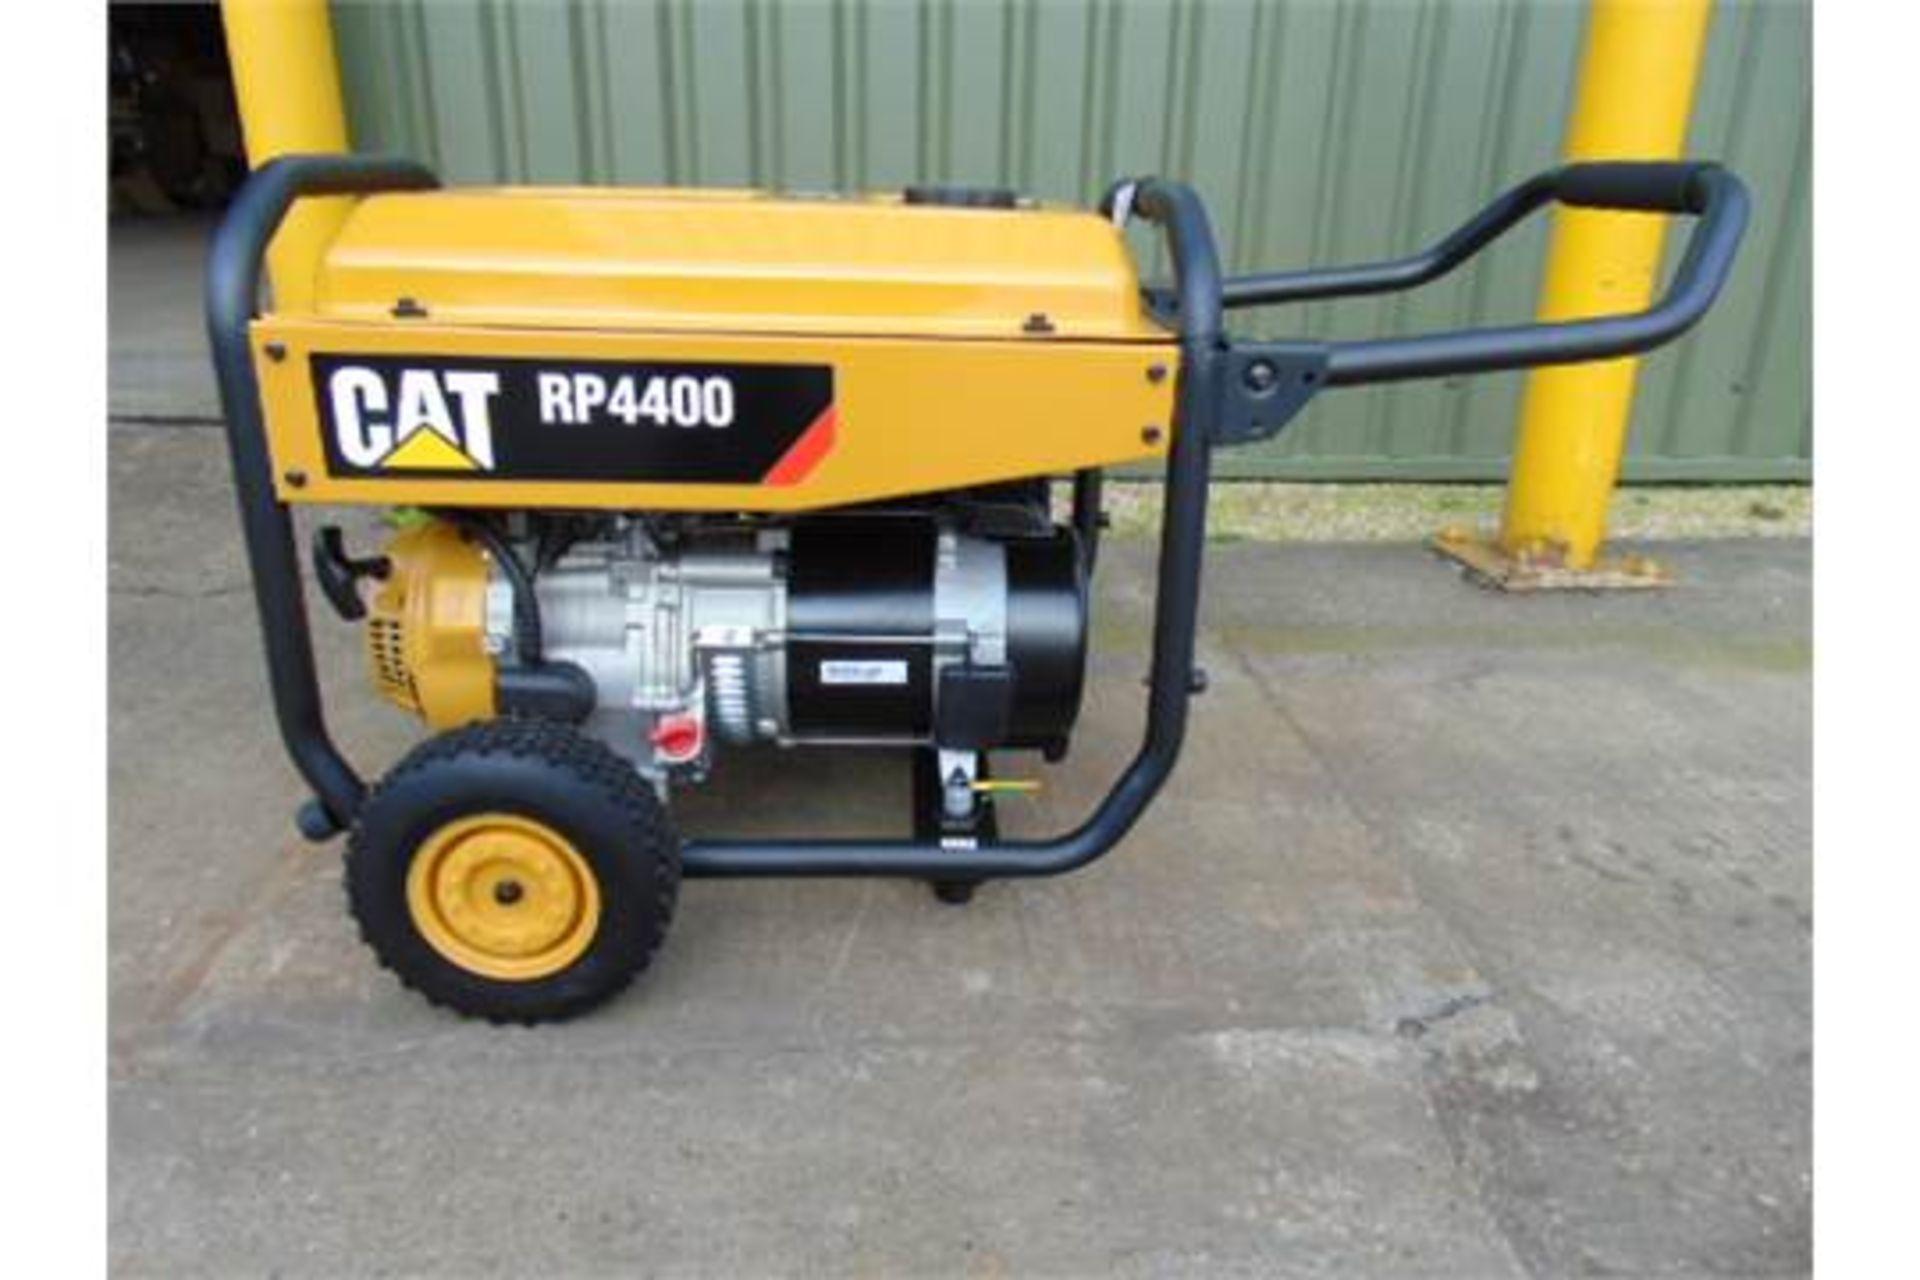 Lot 36 - UNISSUED Caterpillar RP4400 Industrial Petrol Generator Set